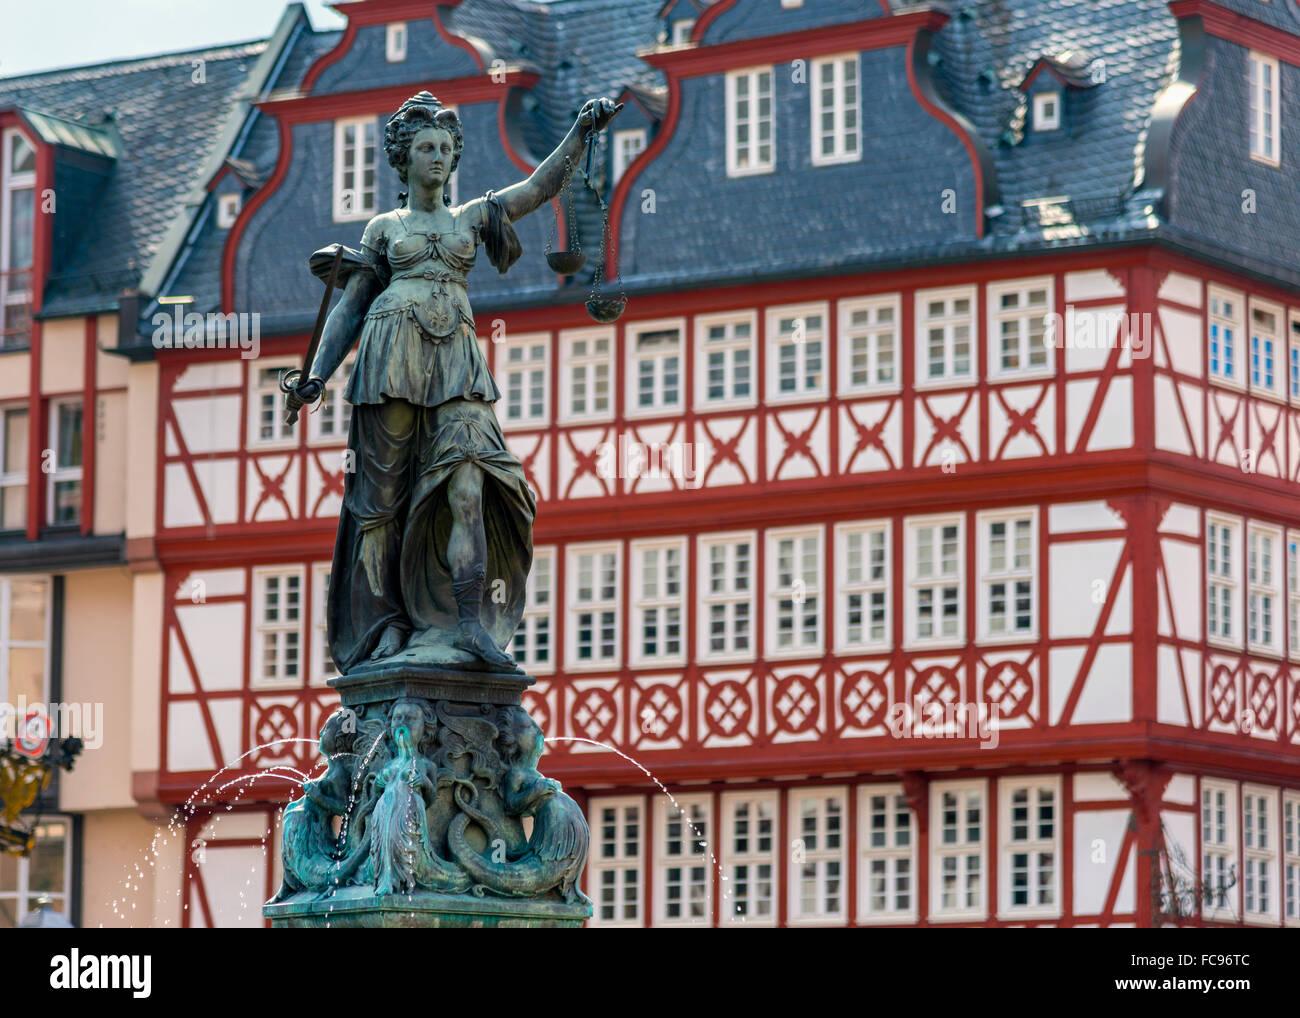 Altstadt (alte Stadt), Romerberg, Frankfurt am Main, Hessen, Deutschland, Europa Stockbild